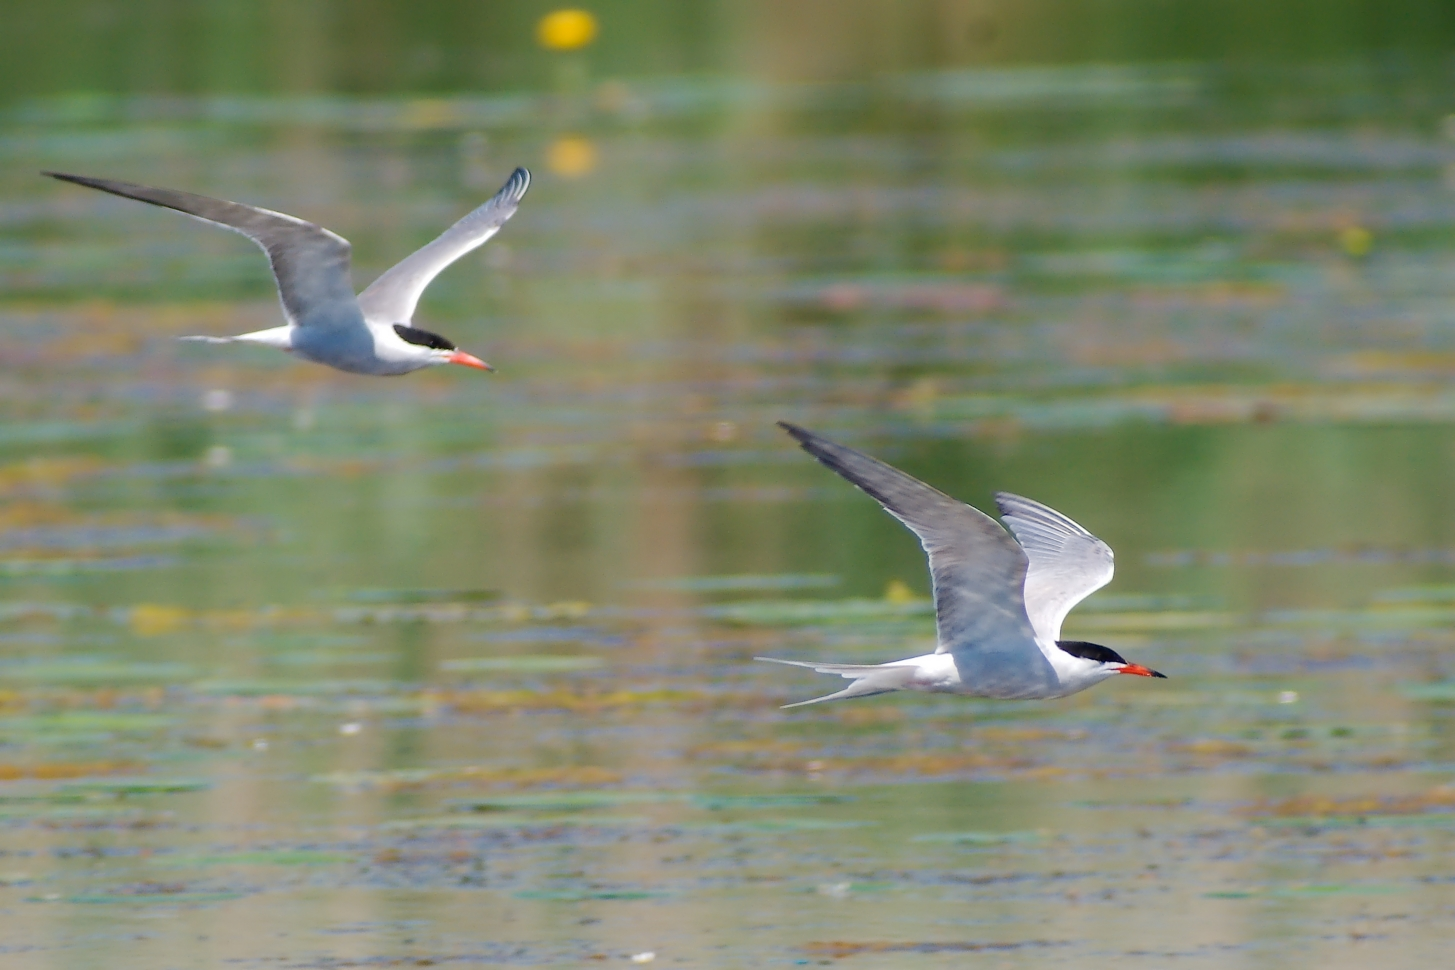 Fluss-Seeschwalbe, Formationsflug